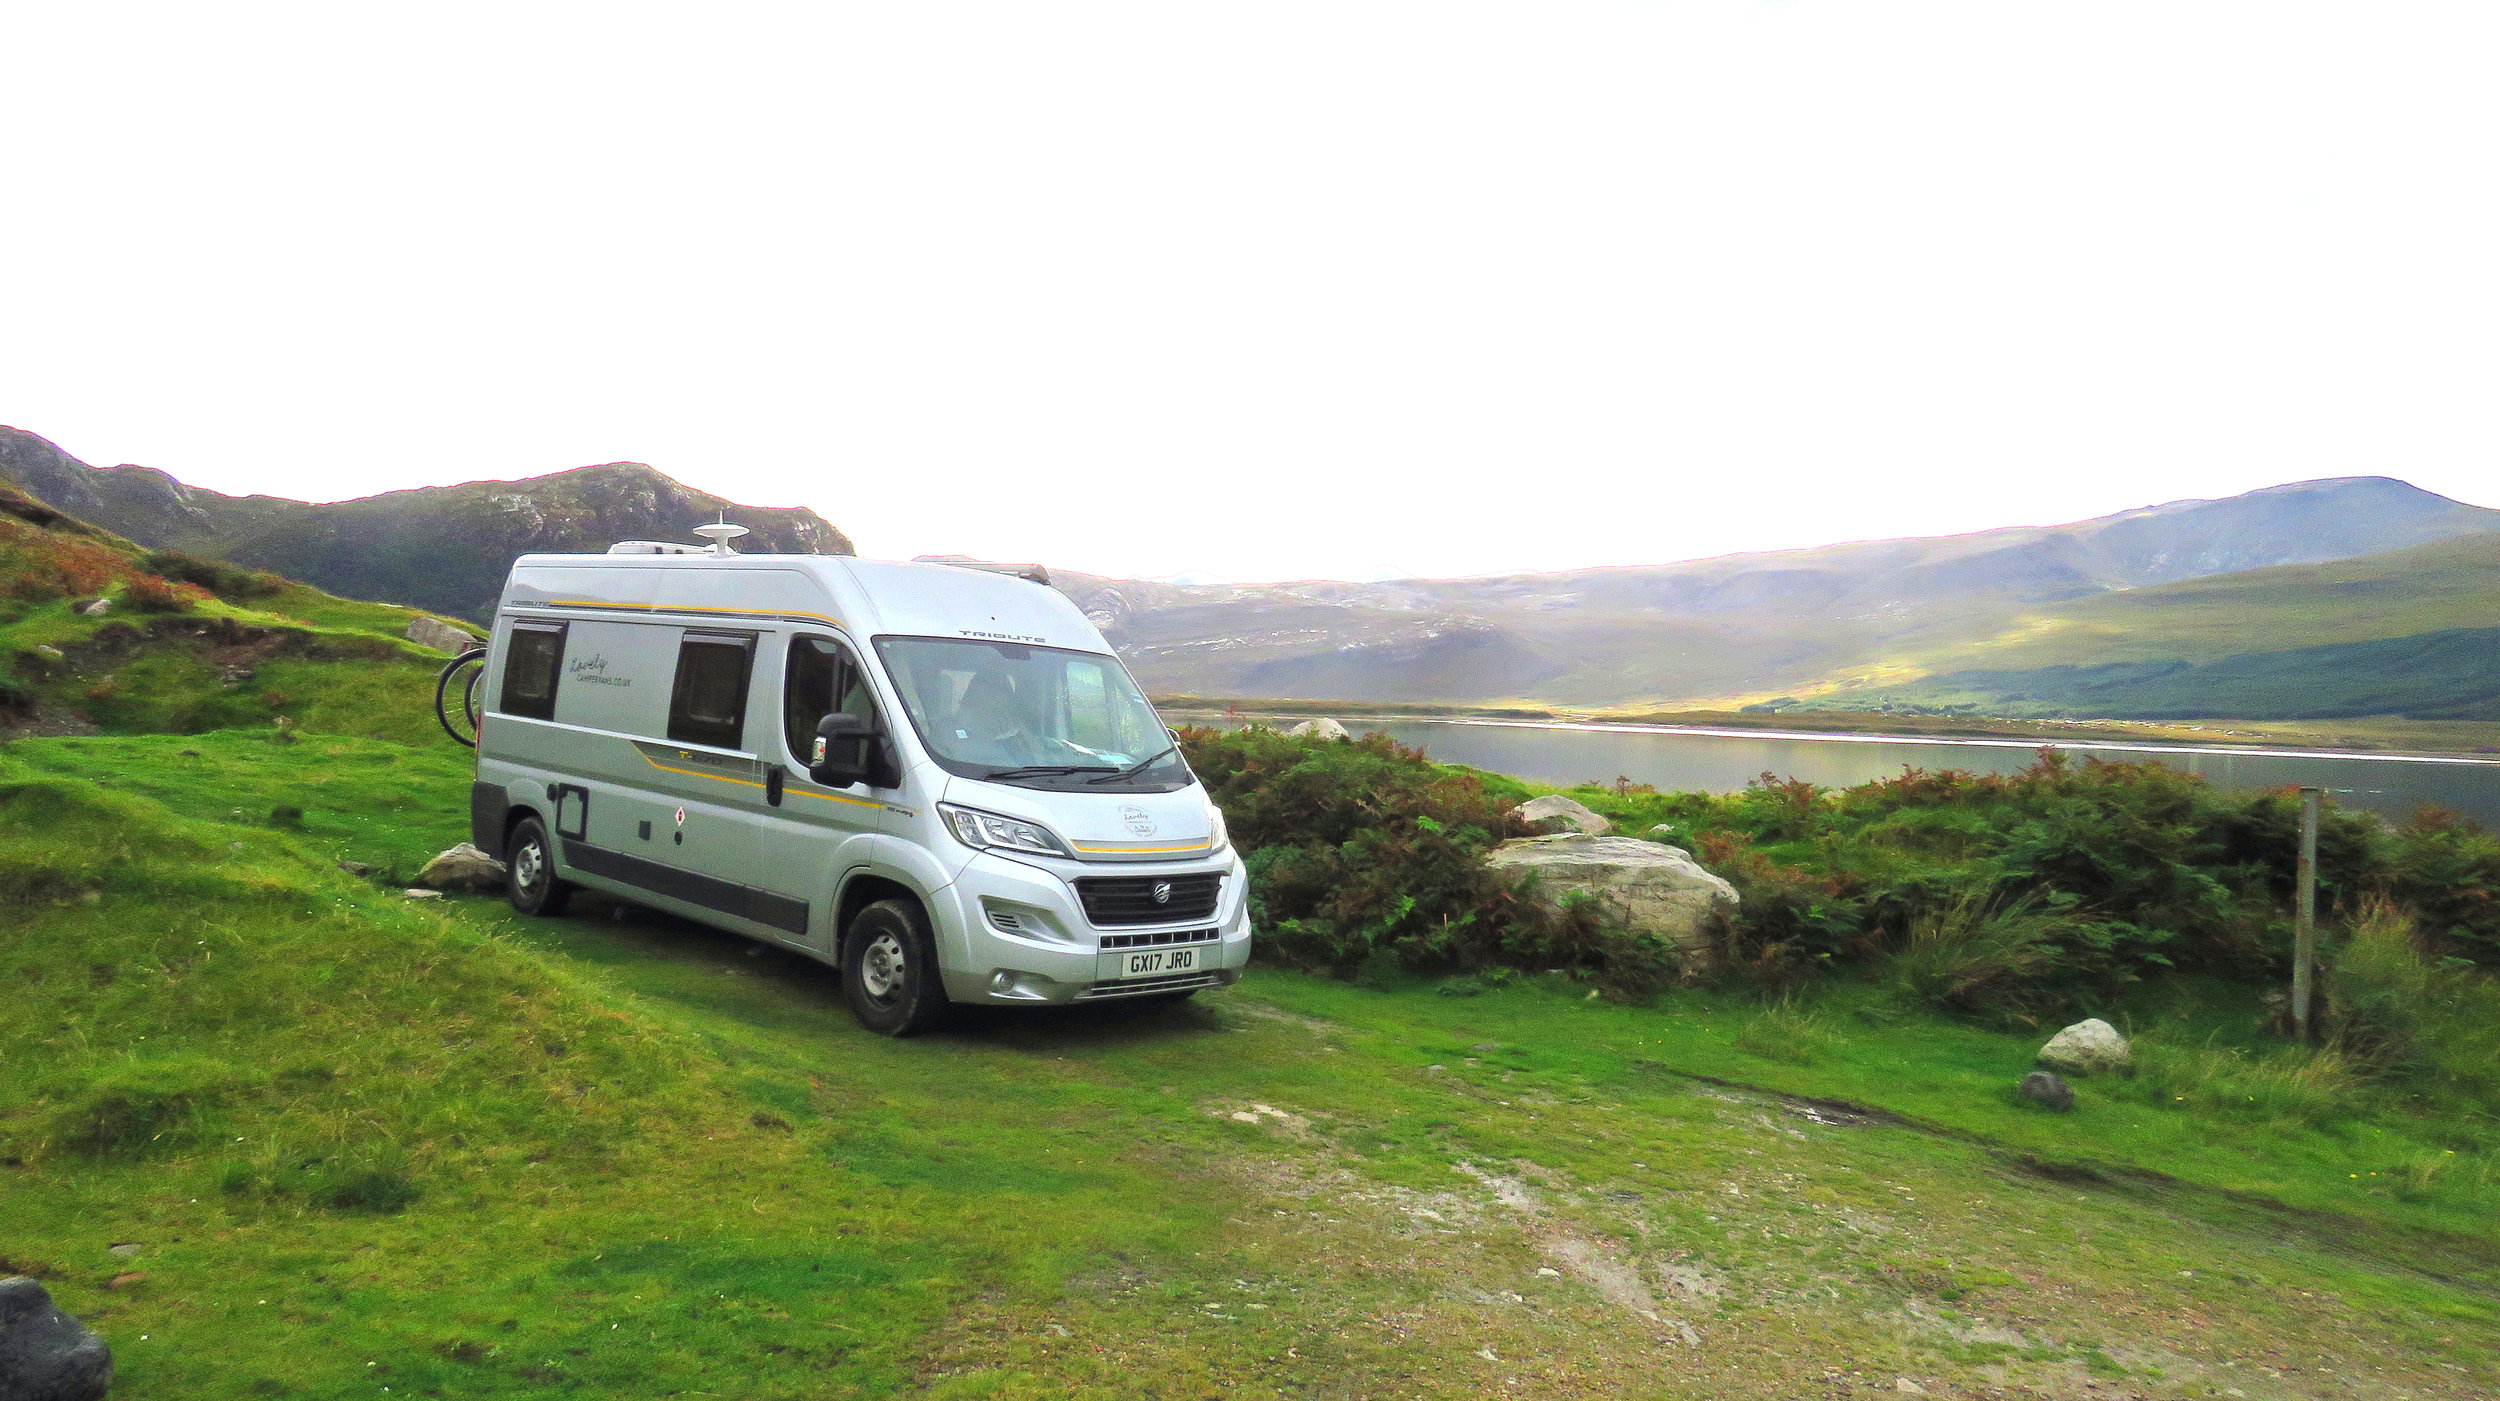 IMG_3262a 'into the wild' Loch Eriboll.jpg